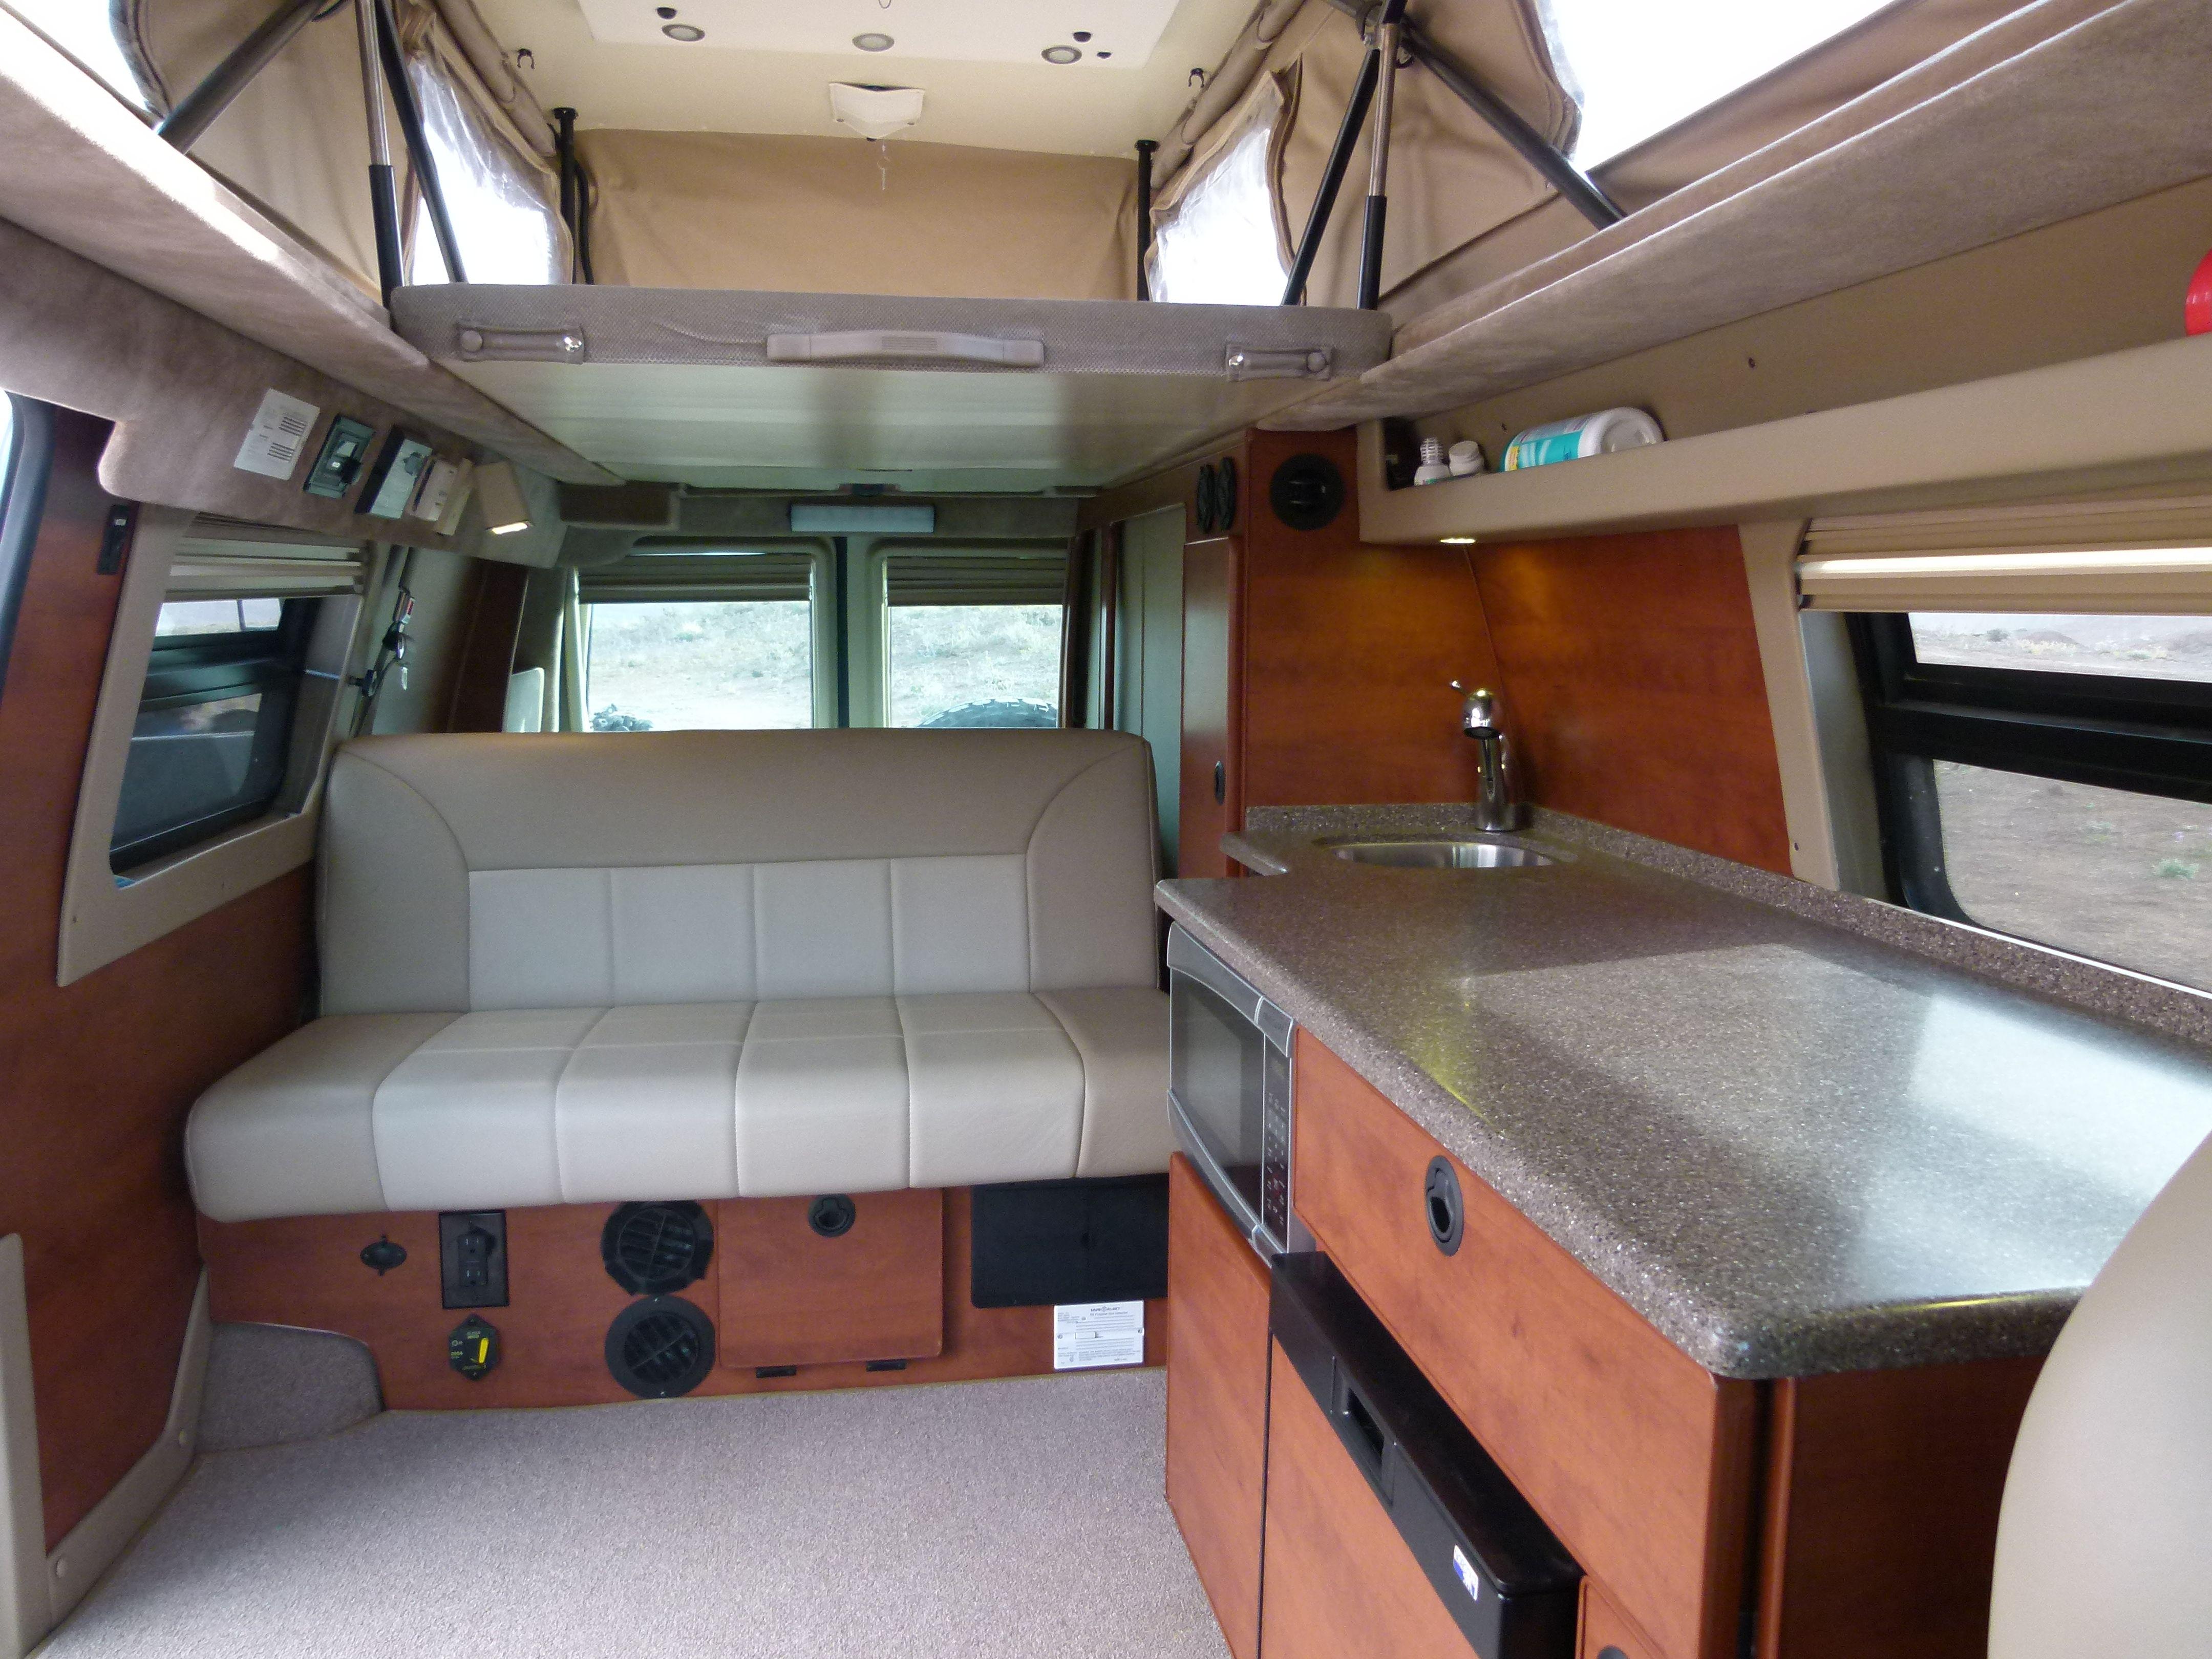 ee88cd5307 Sportsmobile Interior